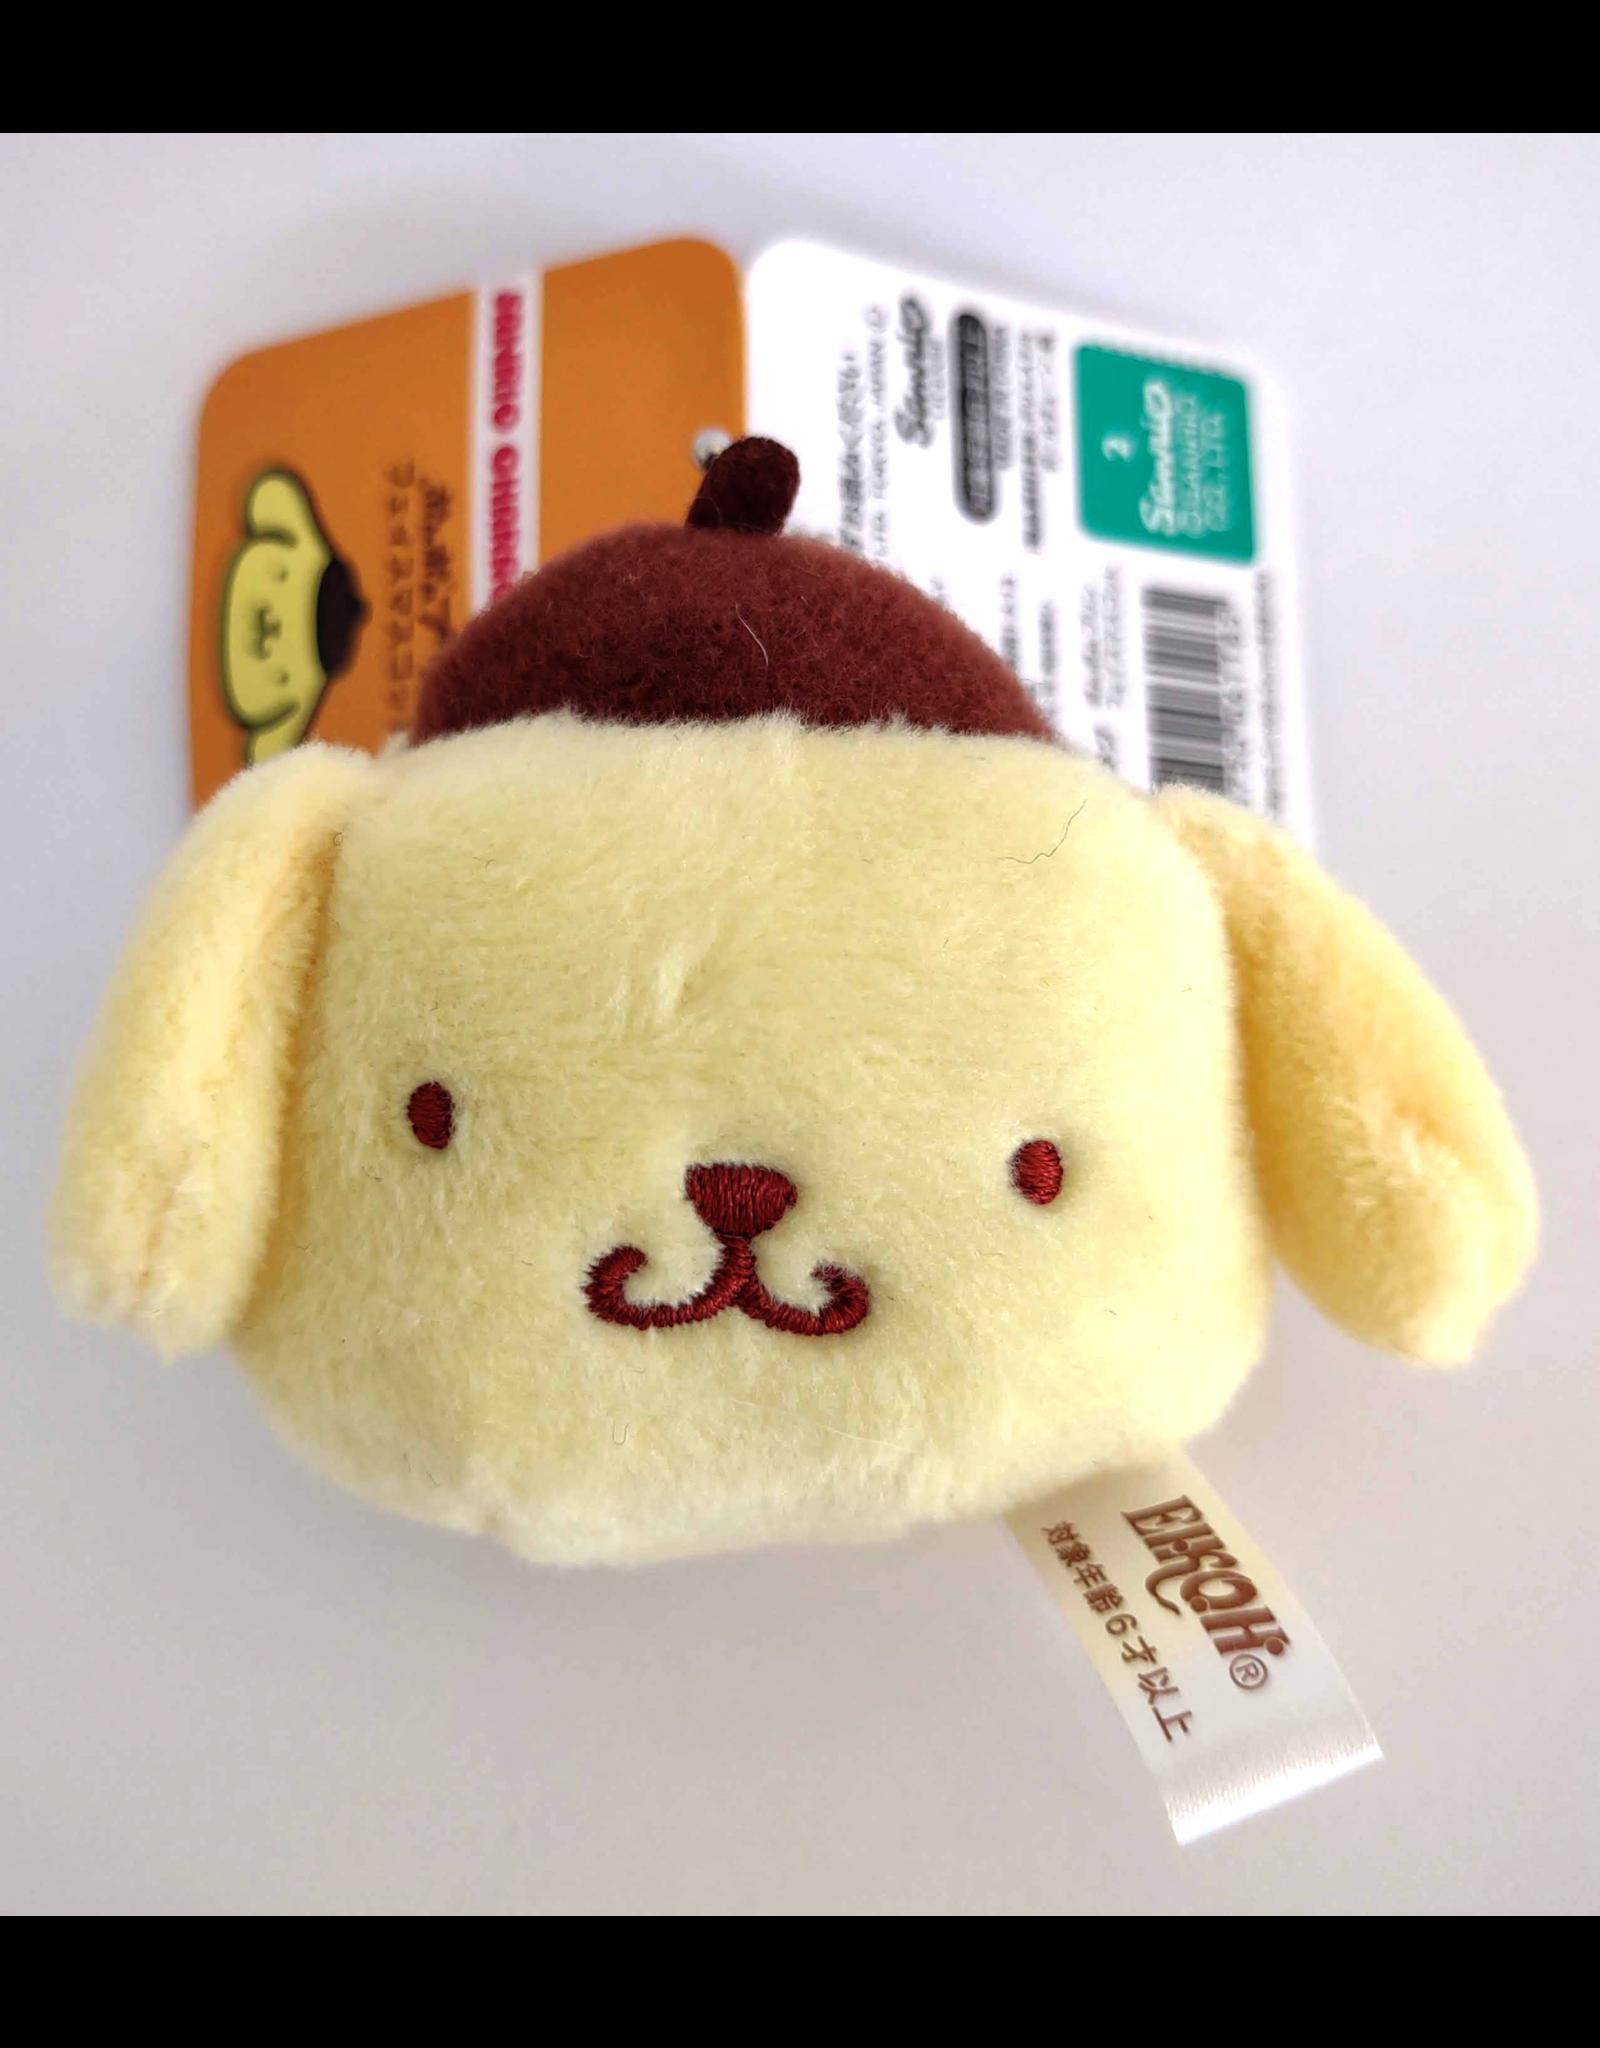 Sanrio Characters - Plush Face Mascot Keychain - Pompompurin - 5 cm